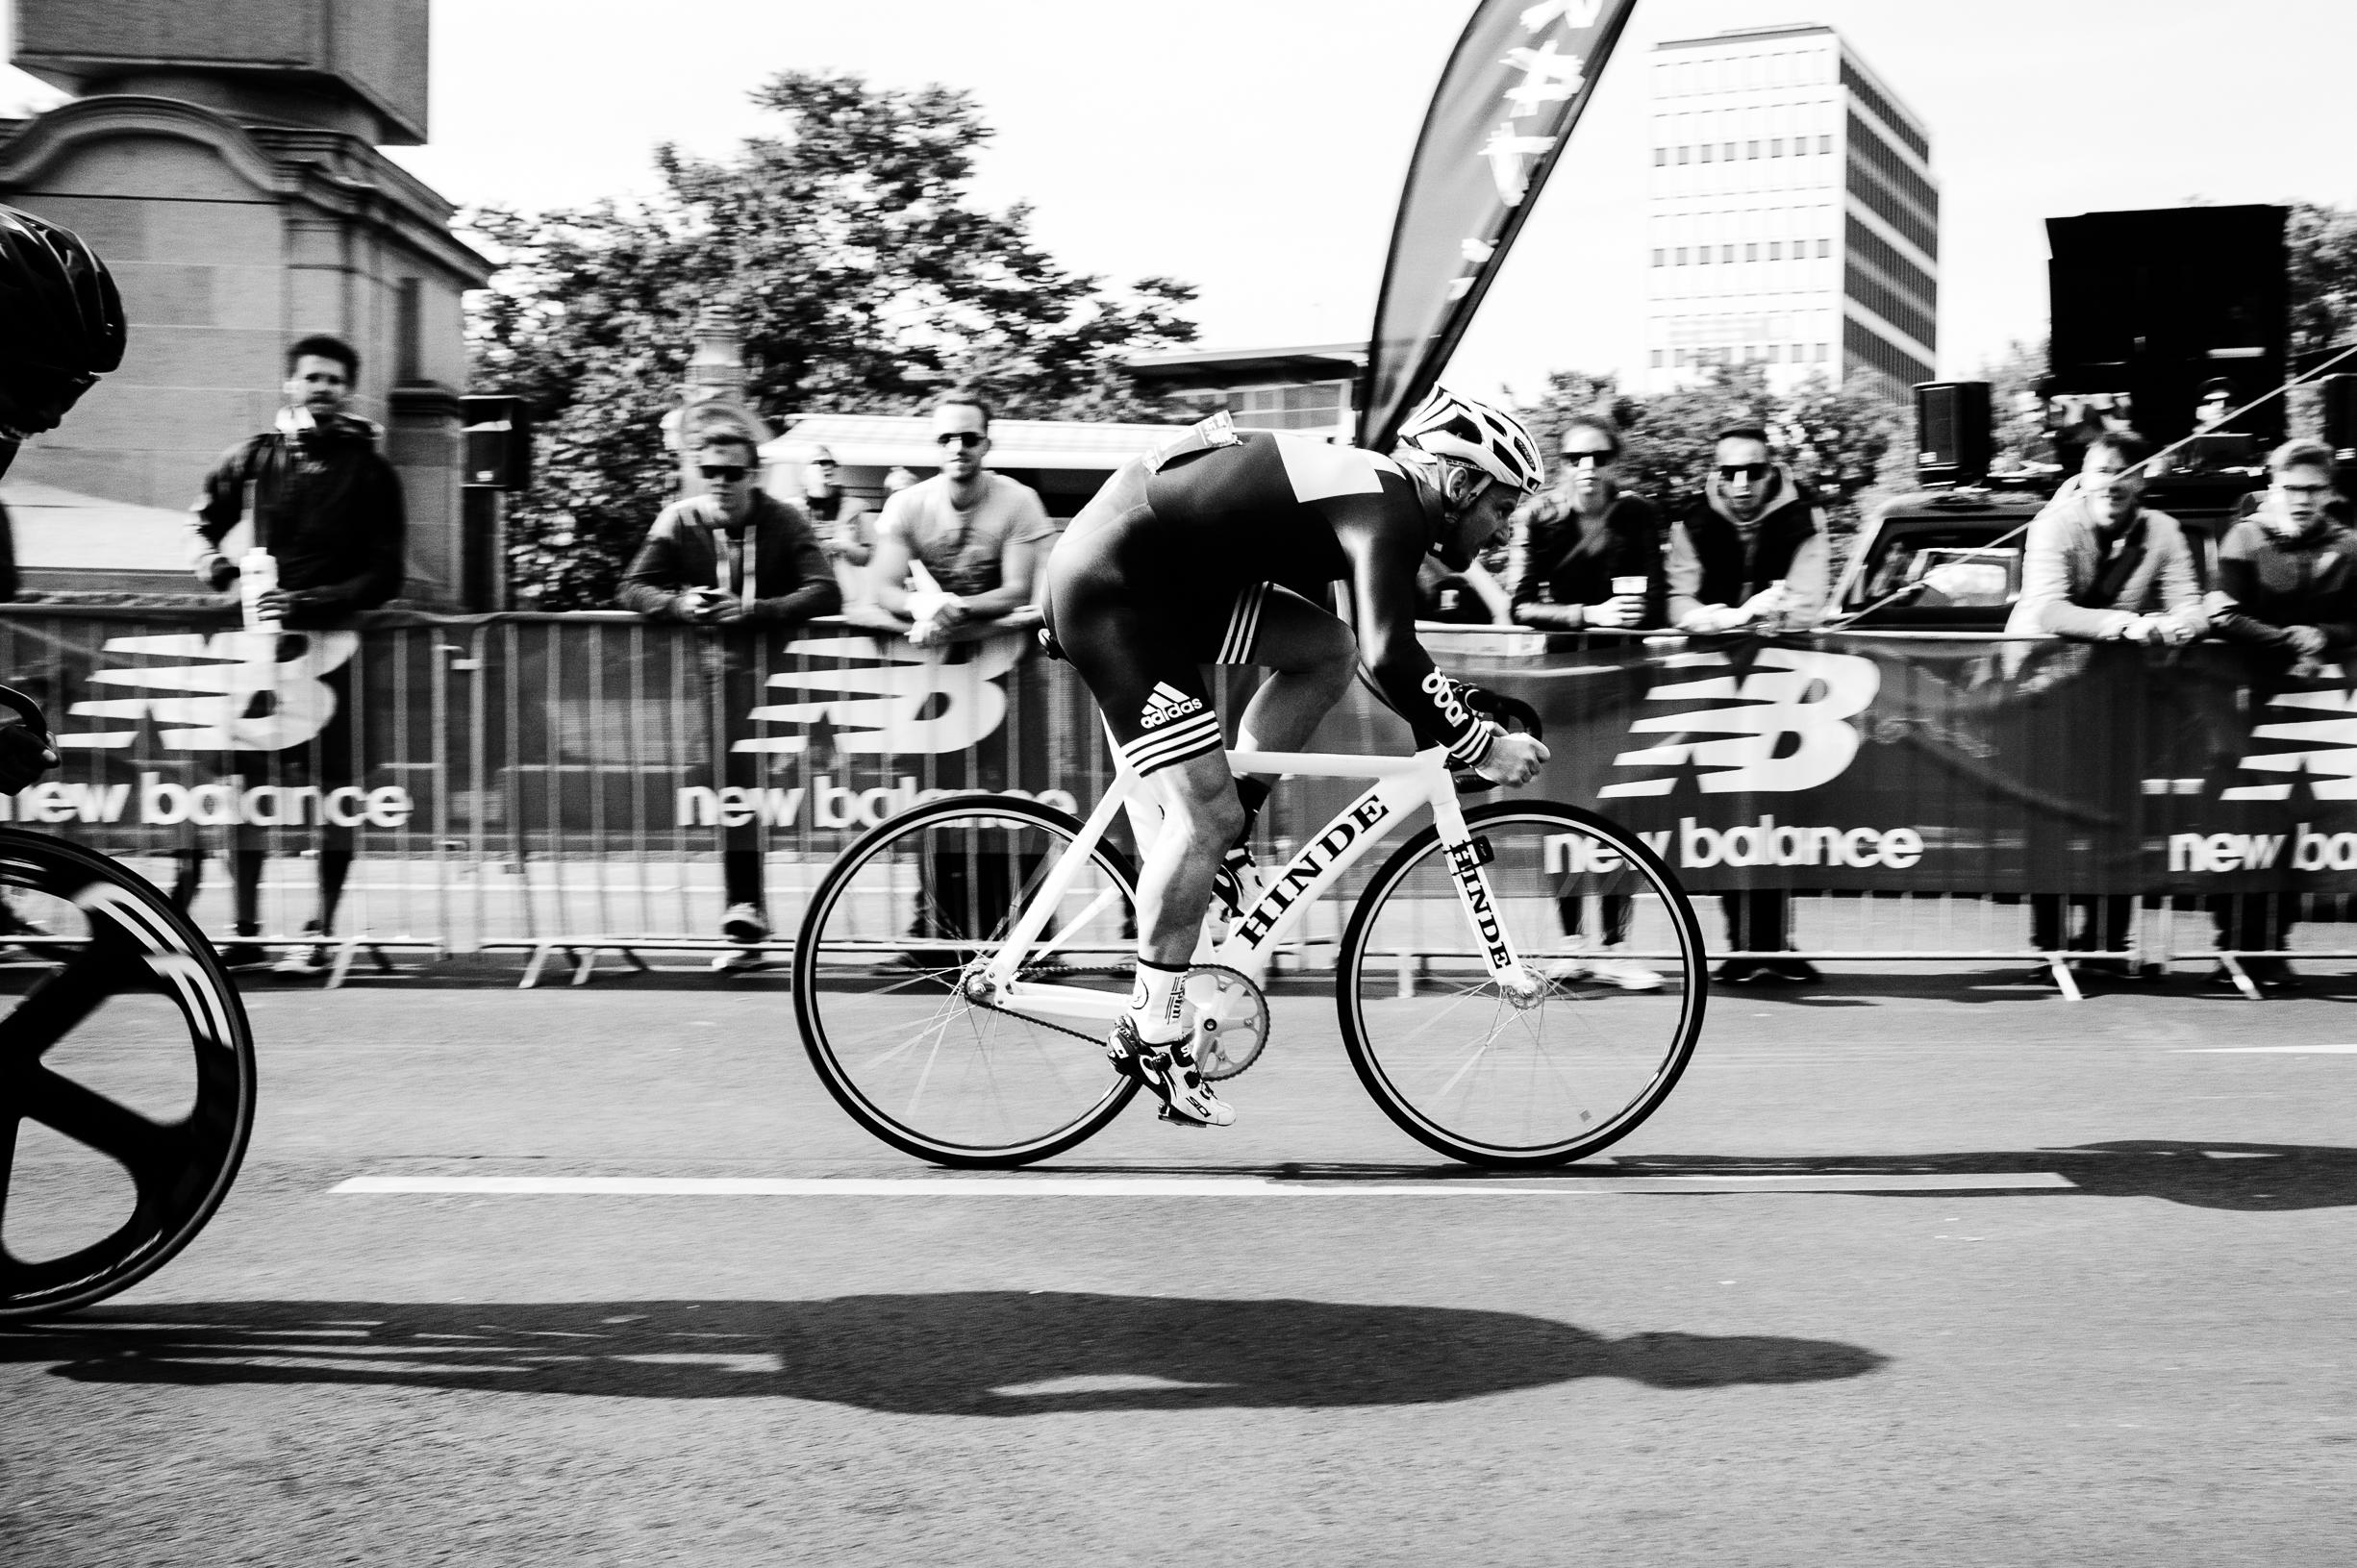 RAD RACE Battle, Berlin May 30 2015 Photo by Drew Kaplan_16.jpg